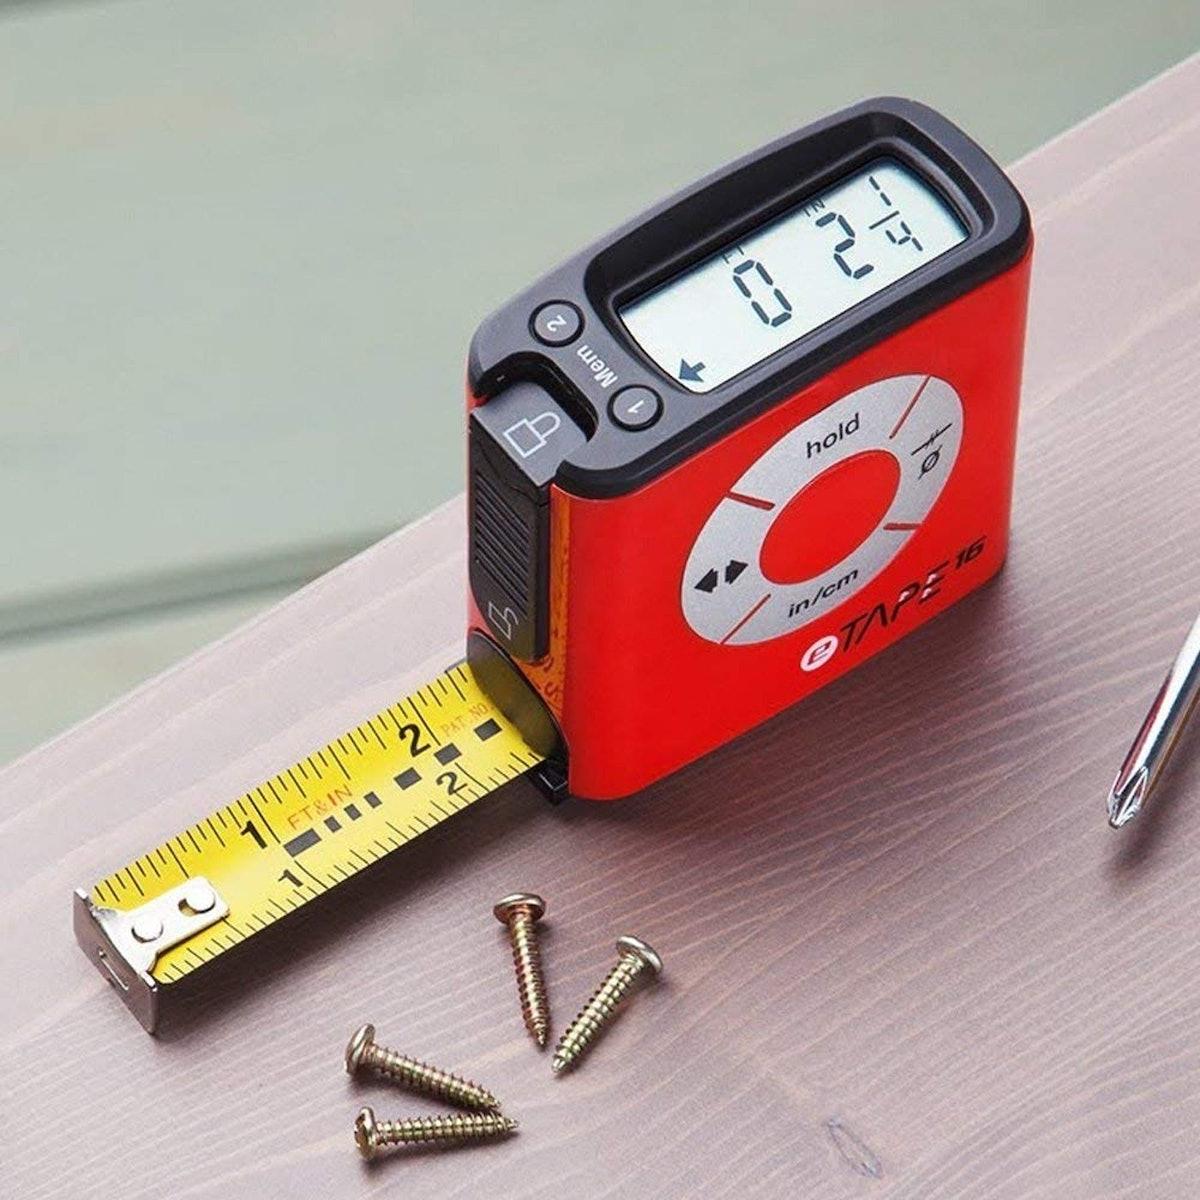 eMeasure Digital Tape Measure